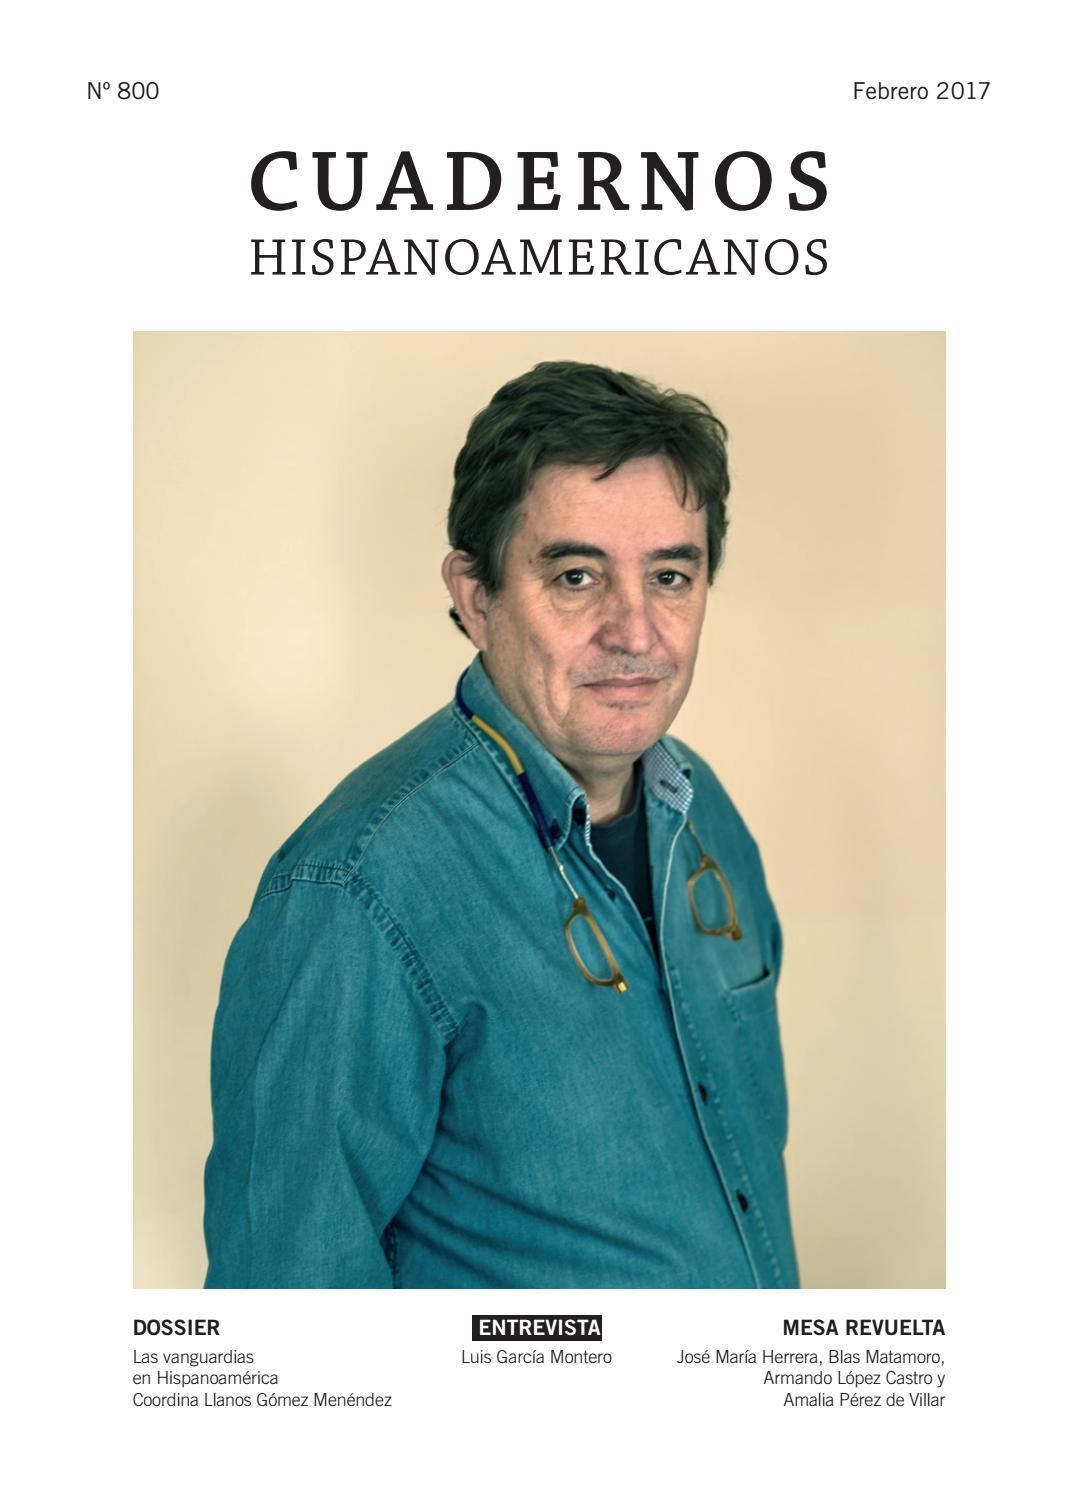 Cuadernos Hispanoamericanos (nº 800, febrero 2017) by AECID ...